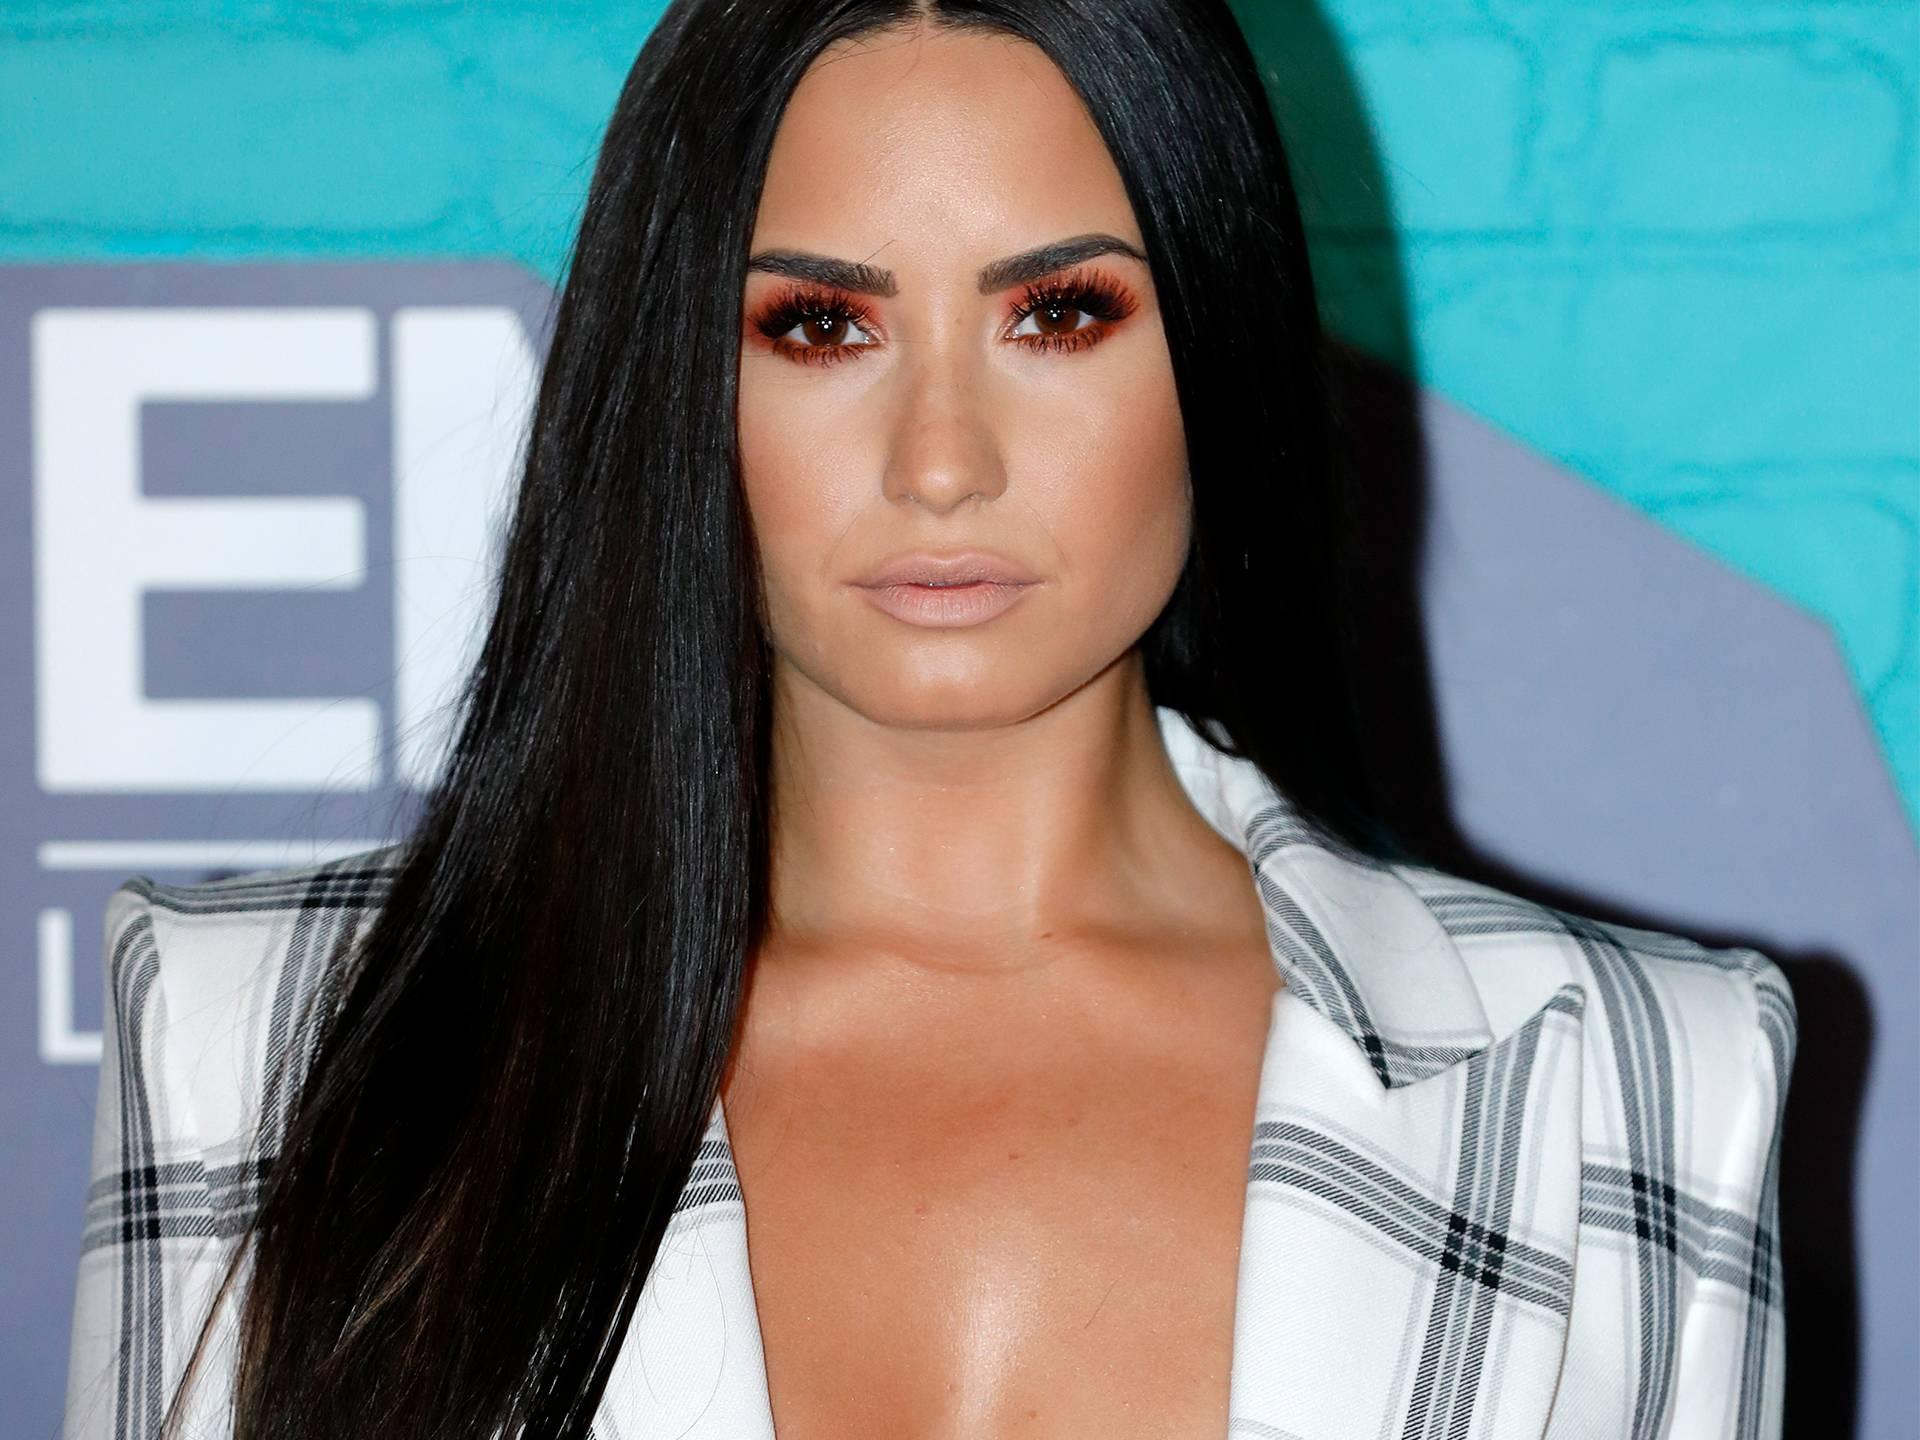 mgid:file:gsp:scenic:/international/mtvema/2017/images/galleries/10-Demi-Lovato-873298744-4x3.jpg